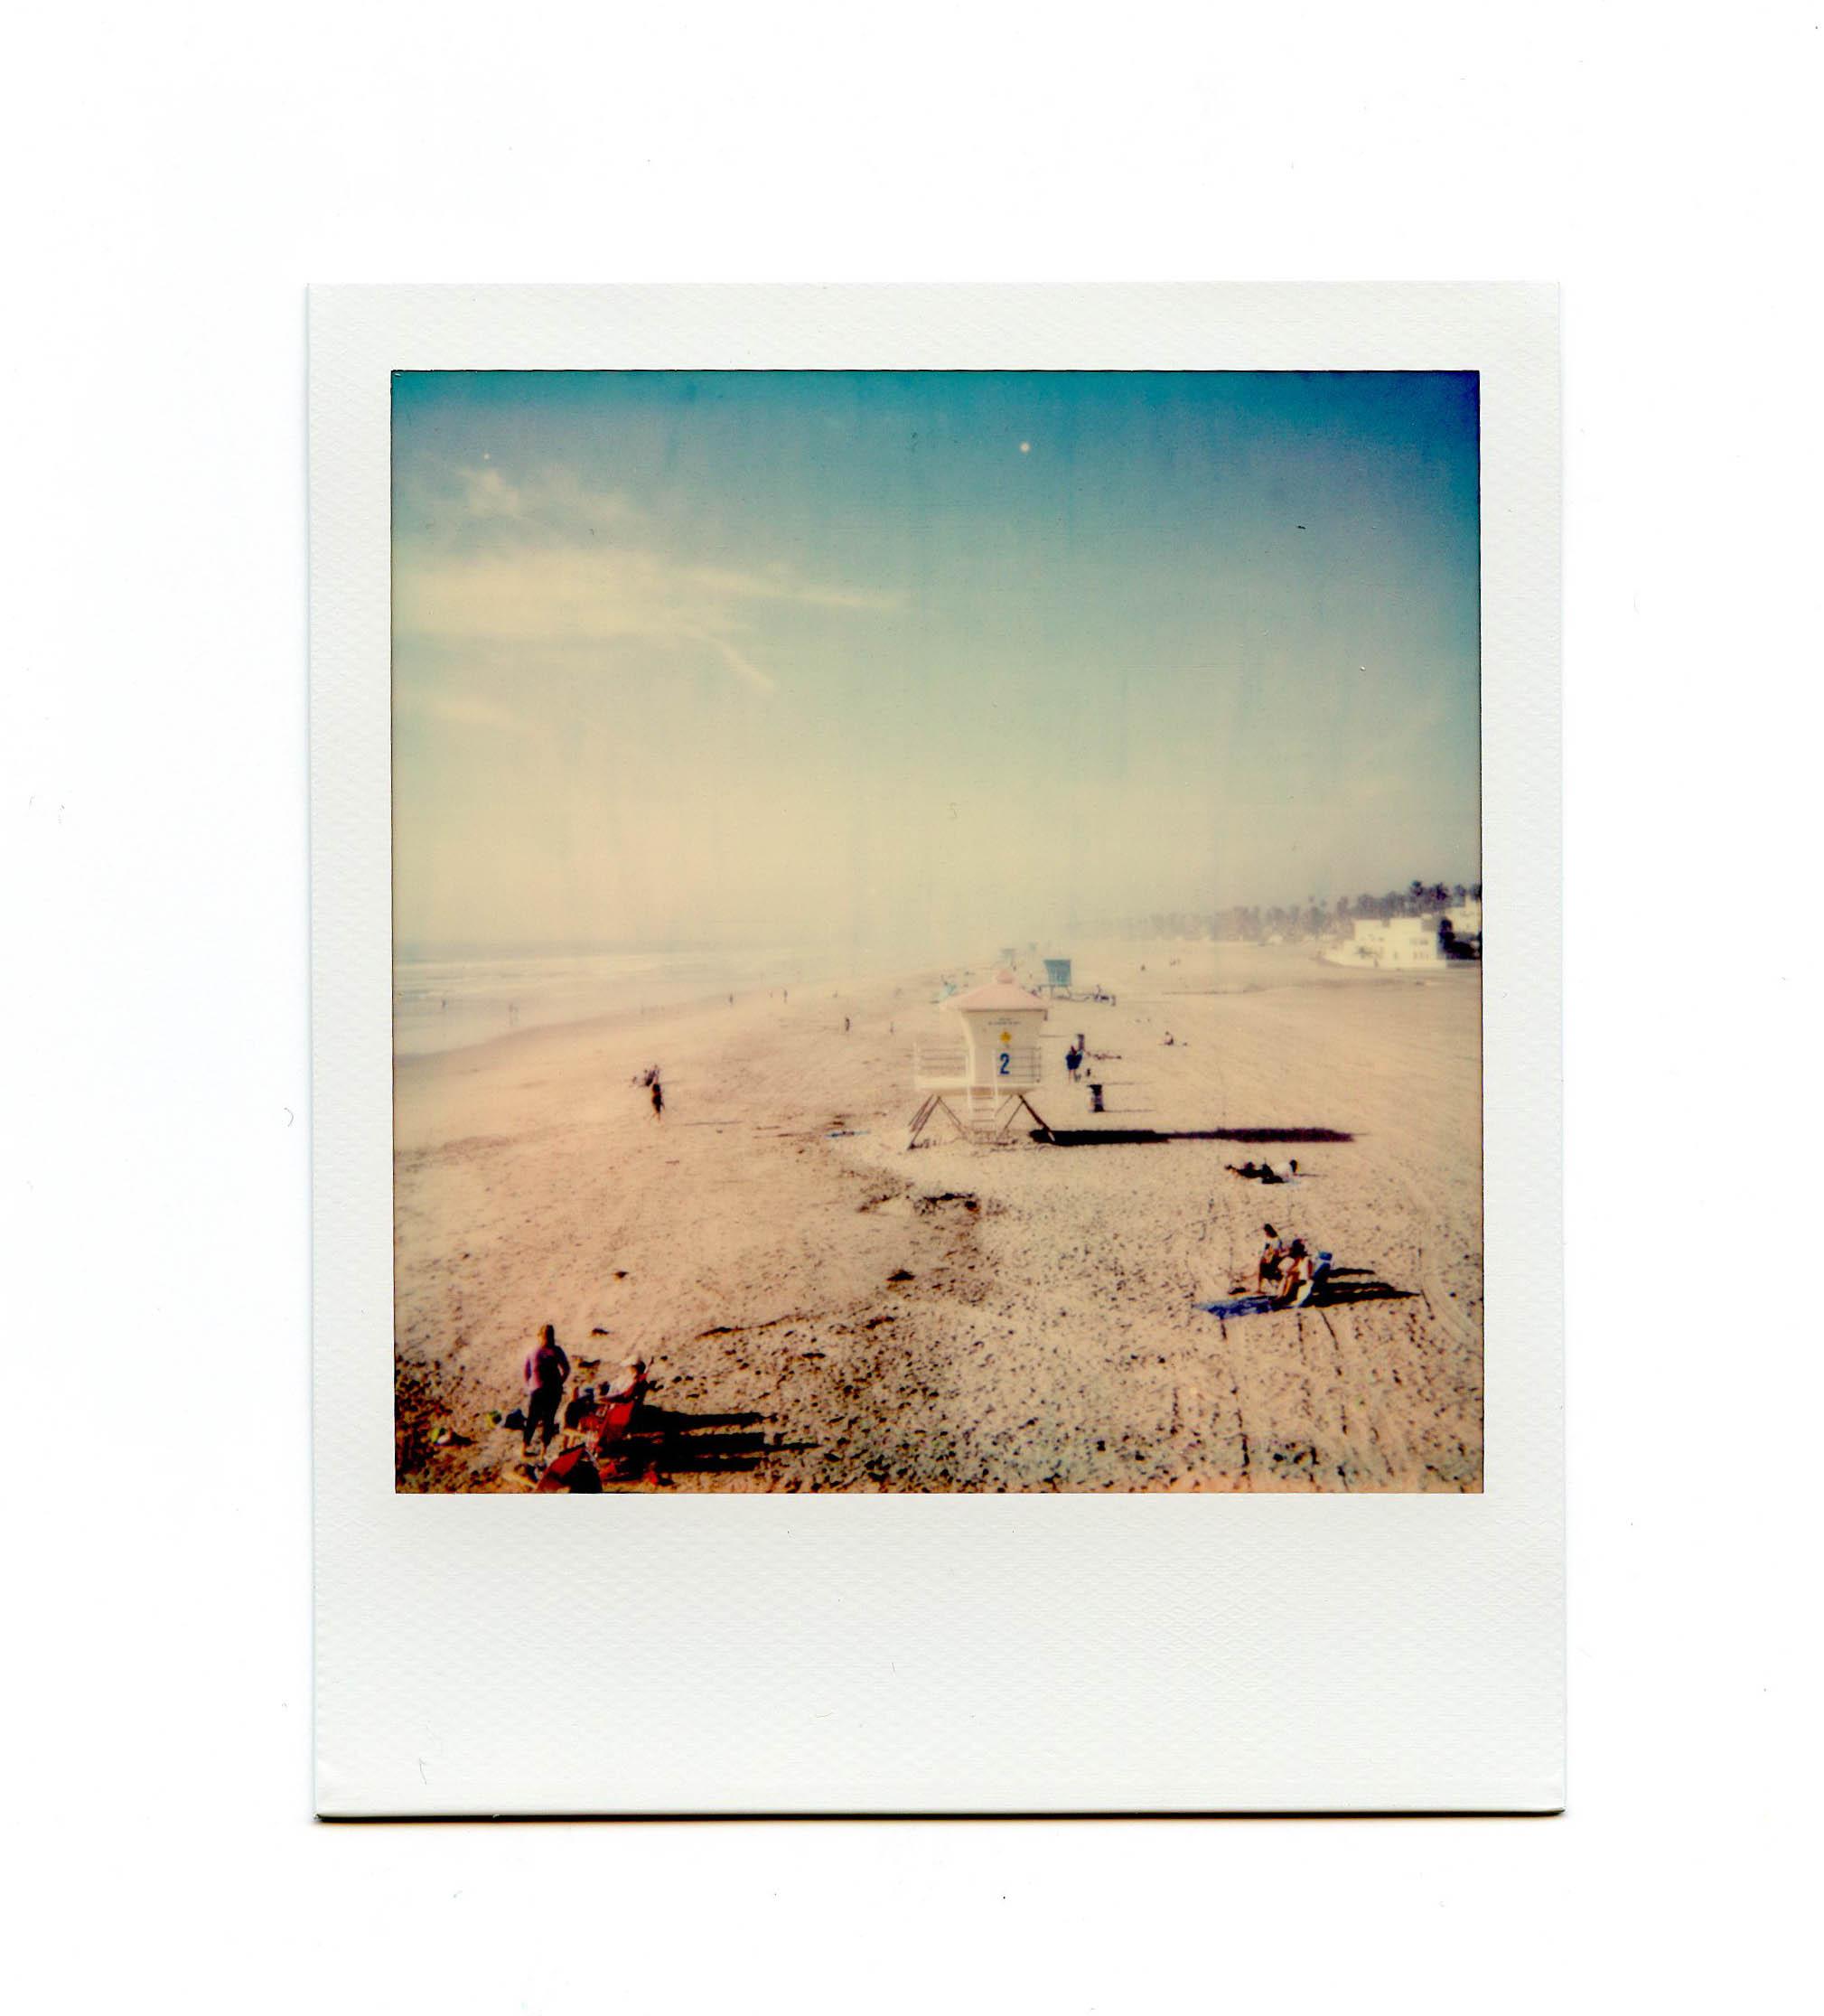 5 Polaroid Sun 600 Instant Film Camera Review - FilterGrade